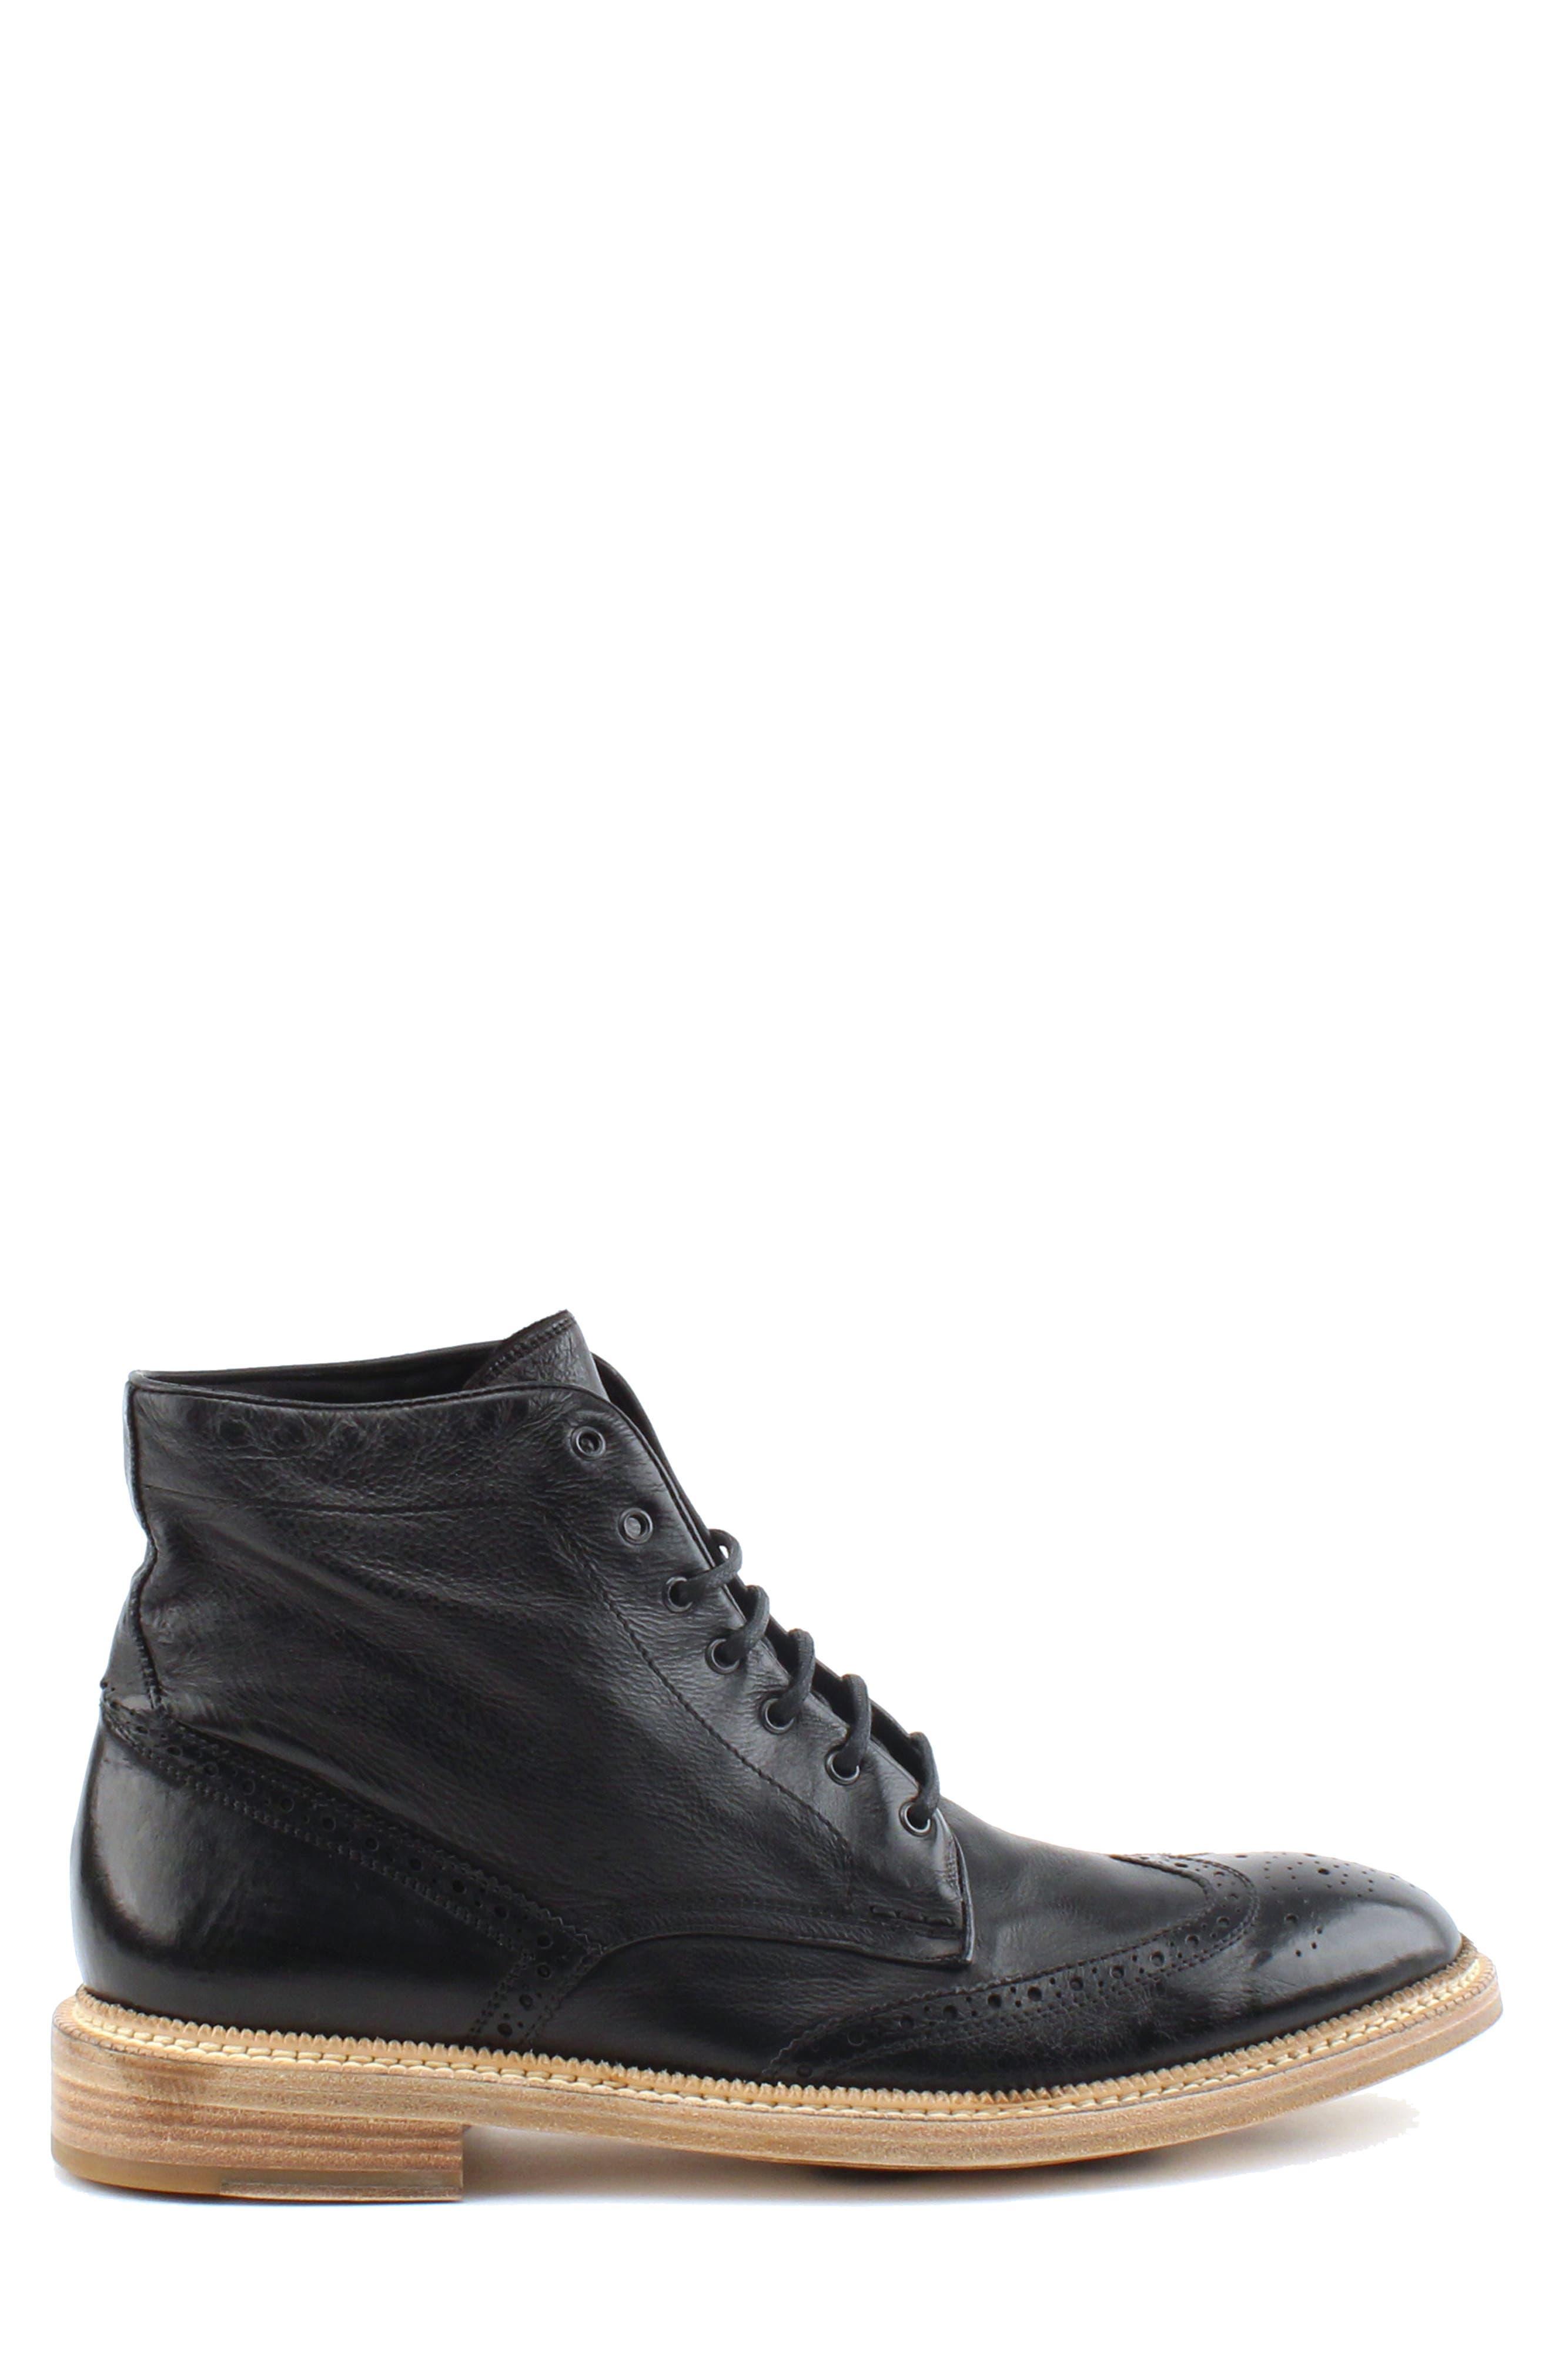 Max Wingtip Boot,                             Alternate thumbnail 3, color,                             001